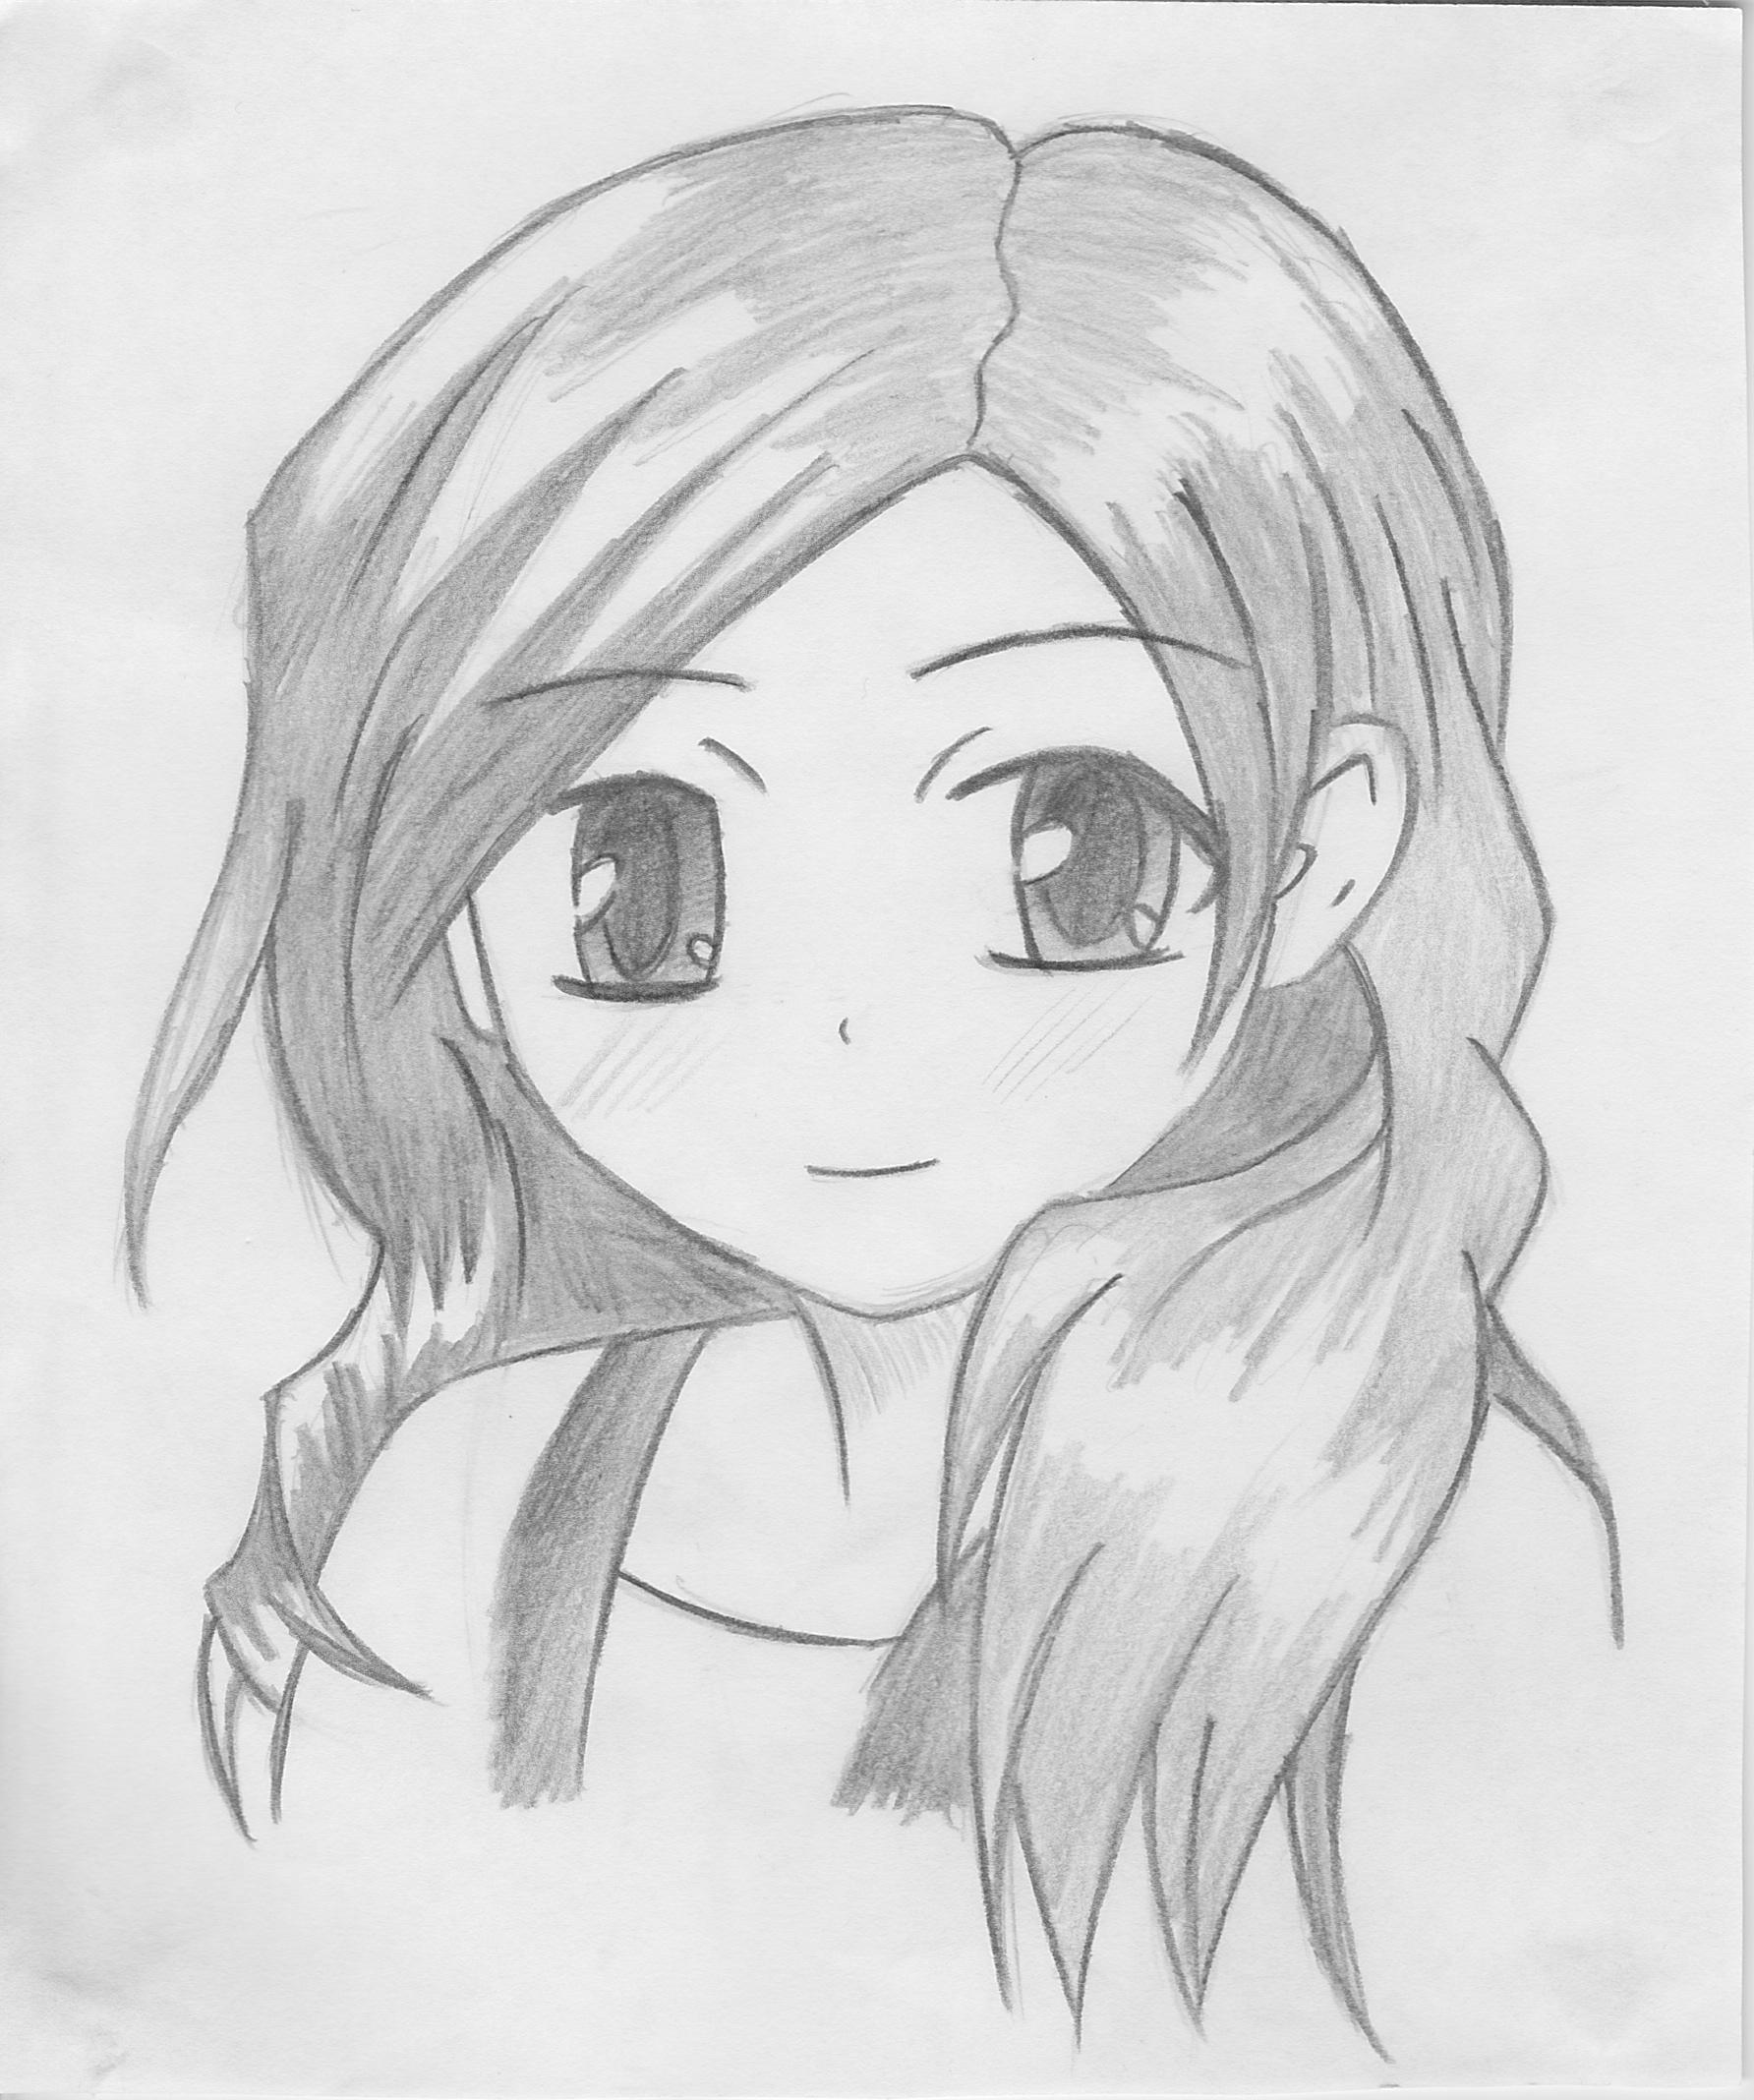 girl anime art - photo #47